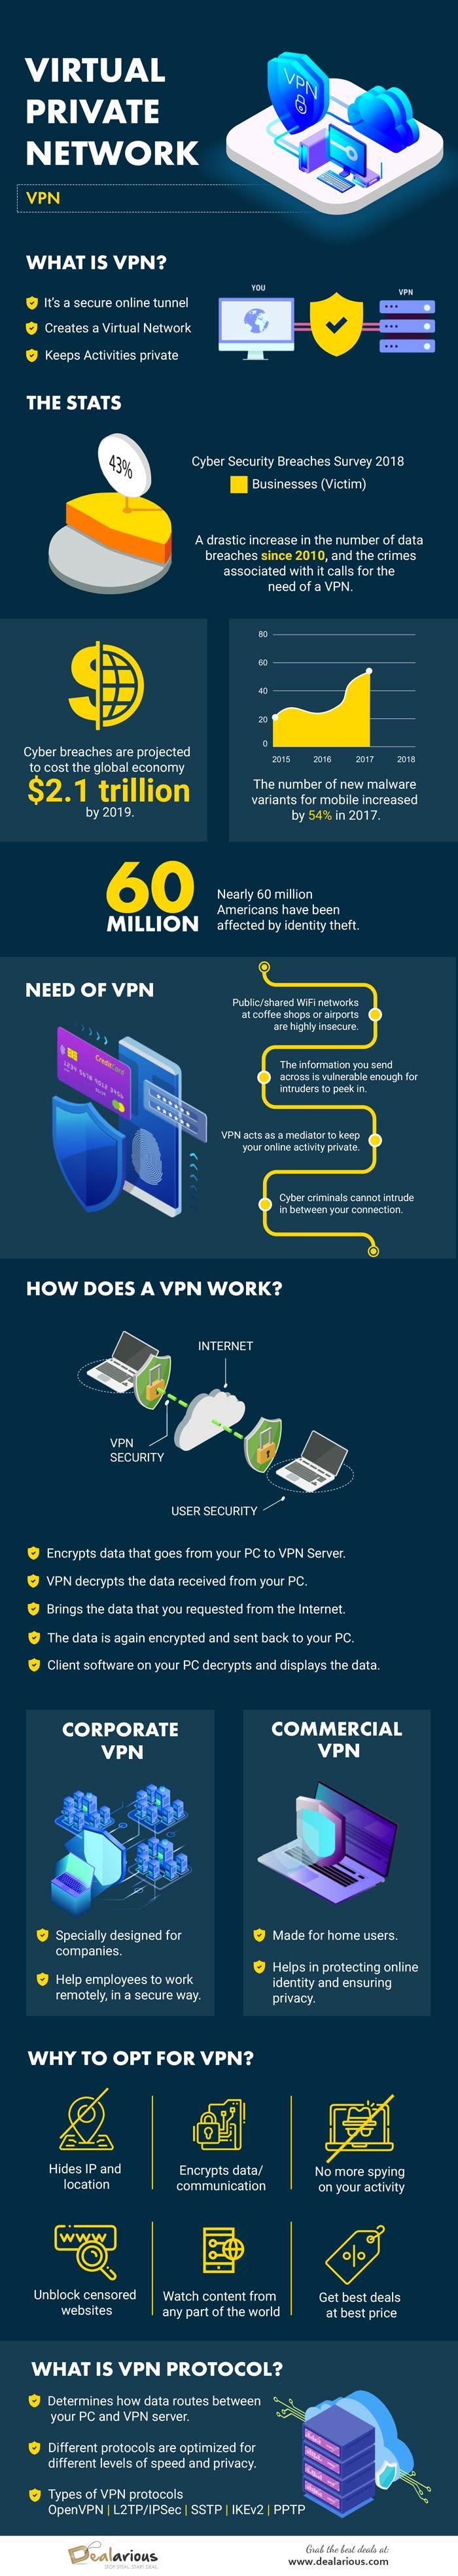 Virtual Private Network #infographic